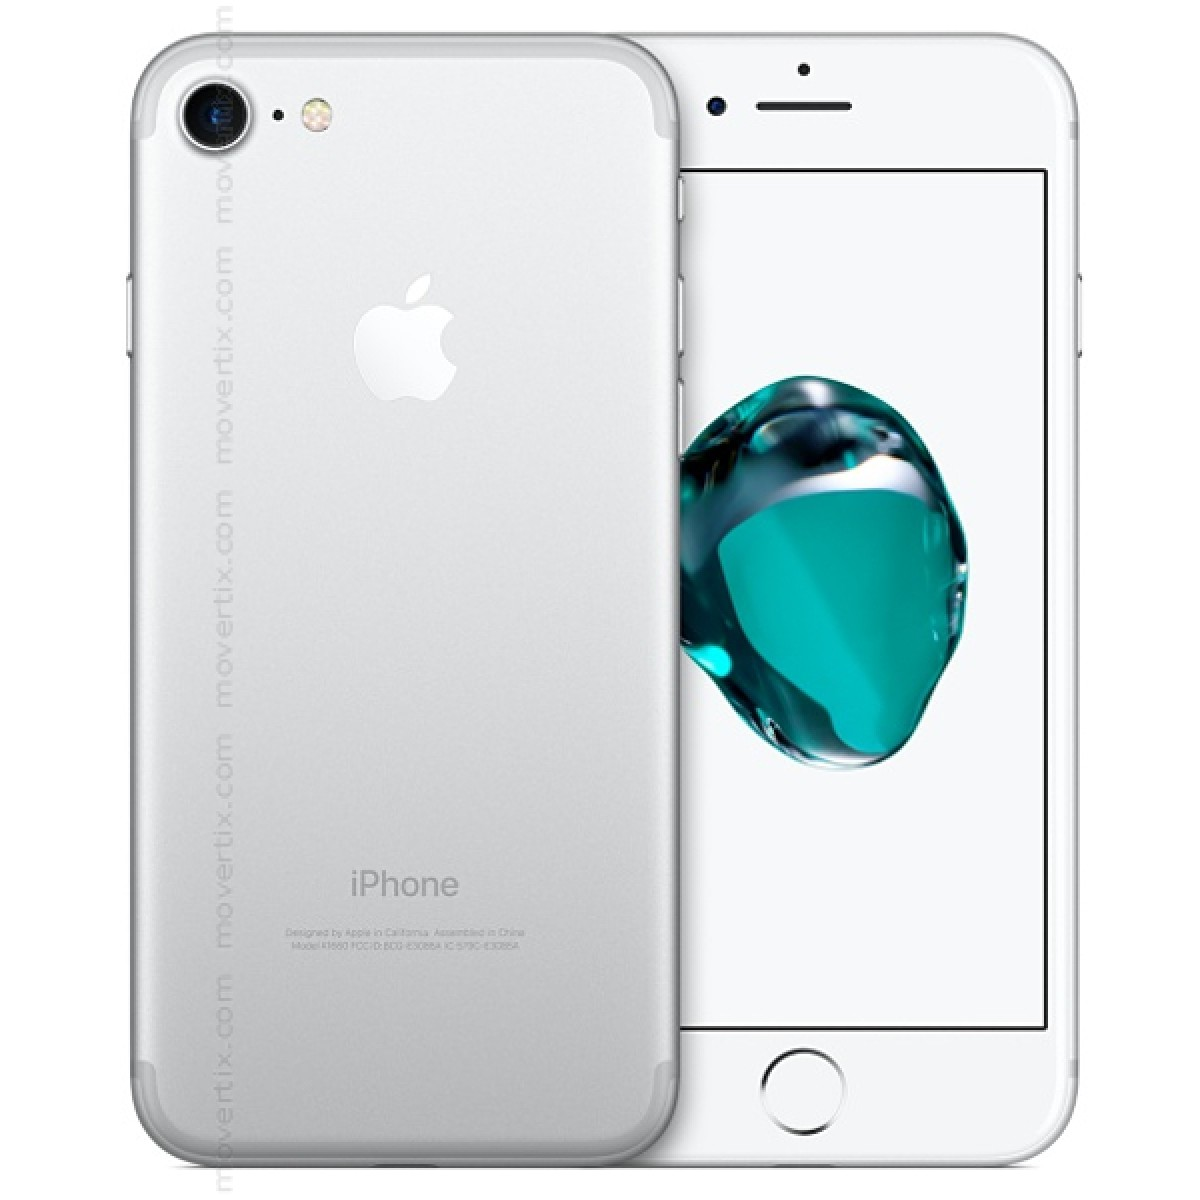 cellulari apple iphone prezzo